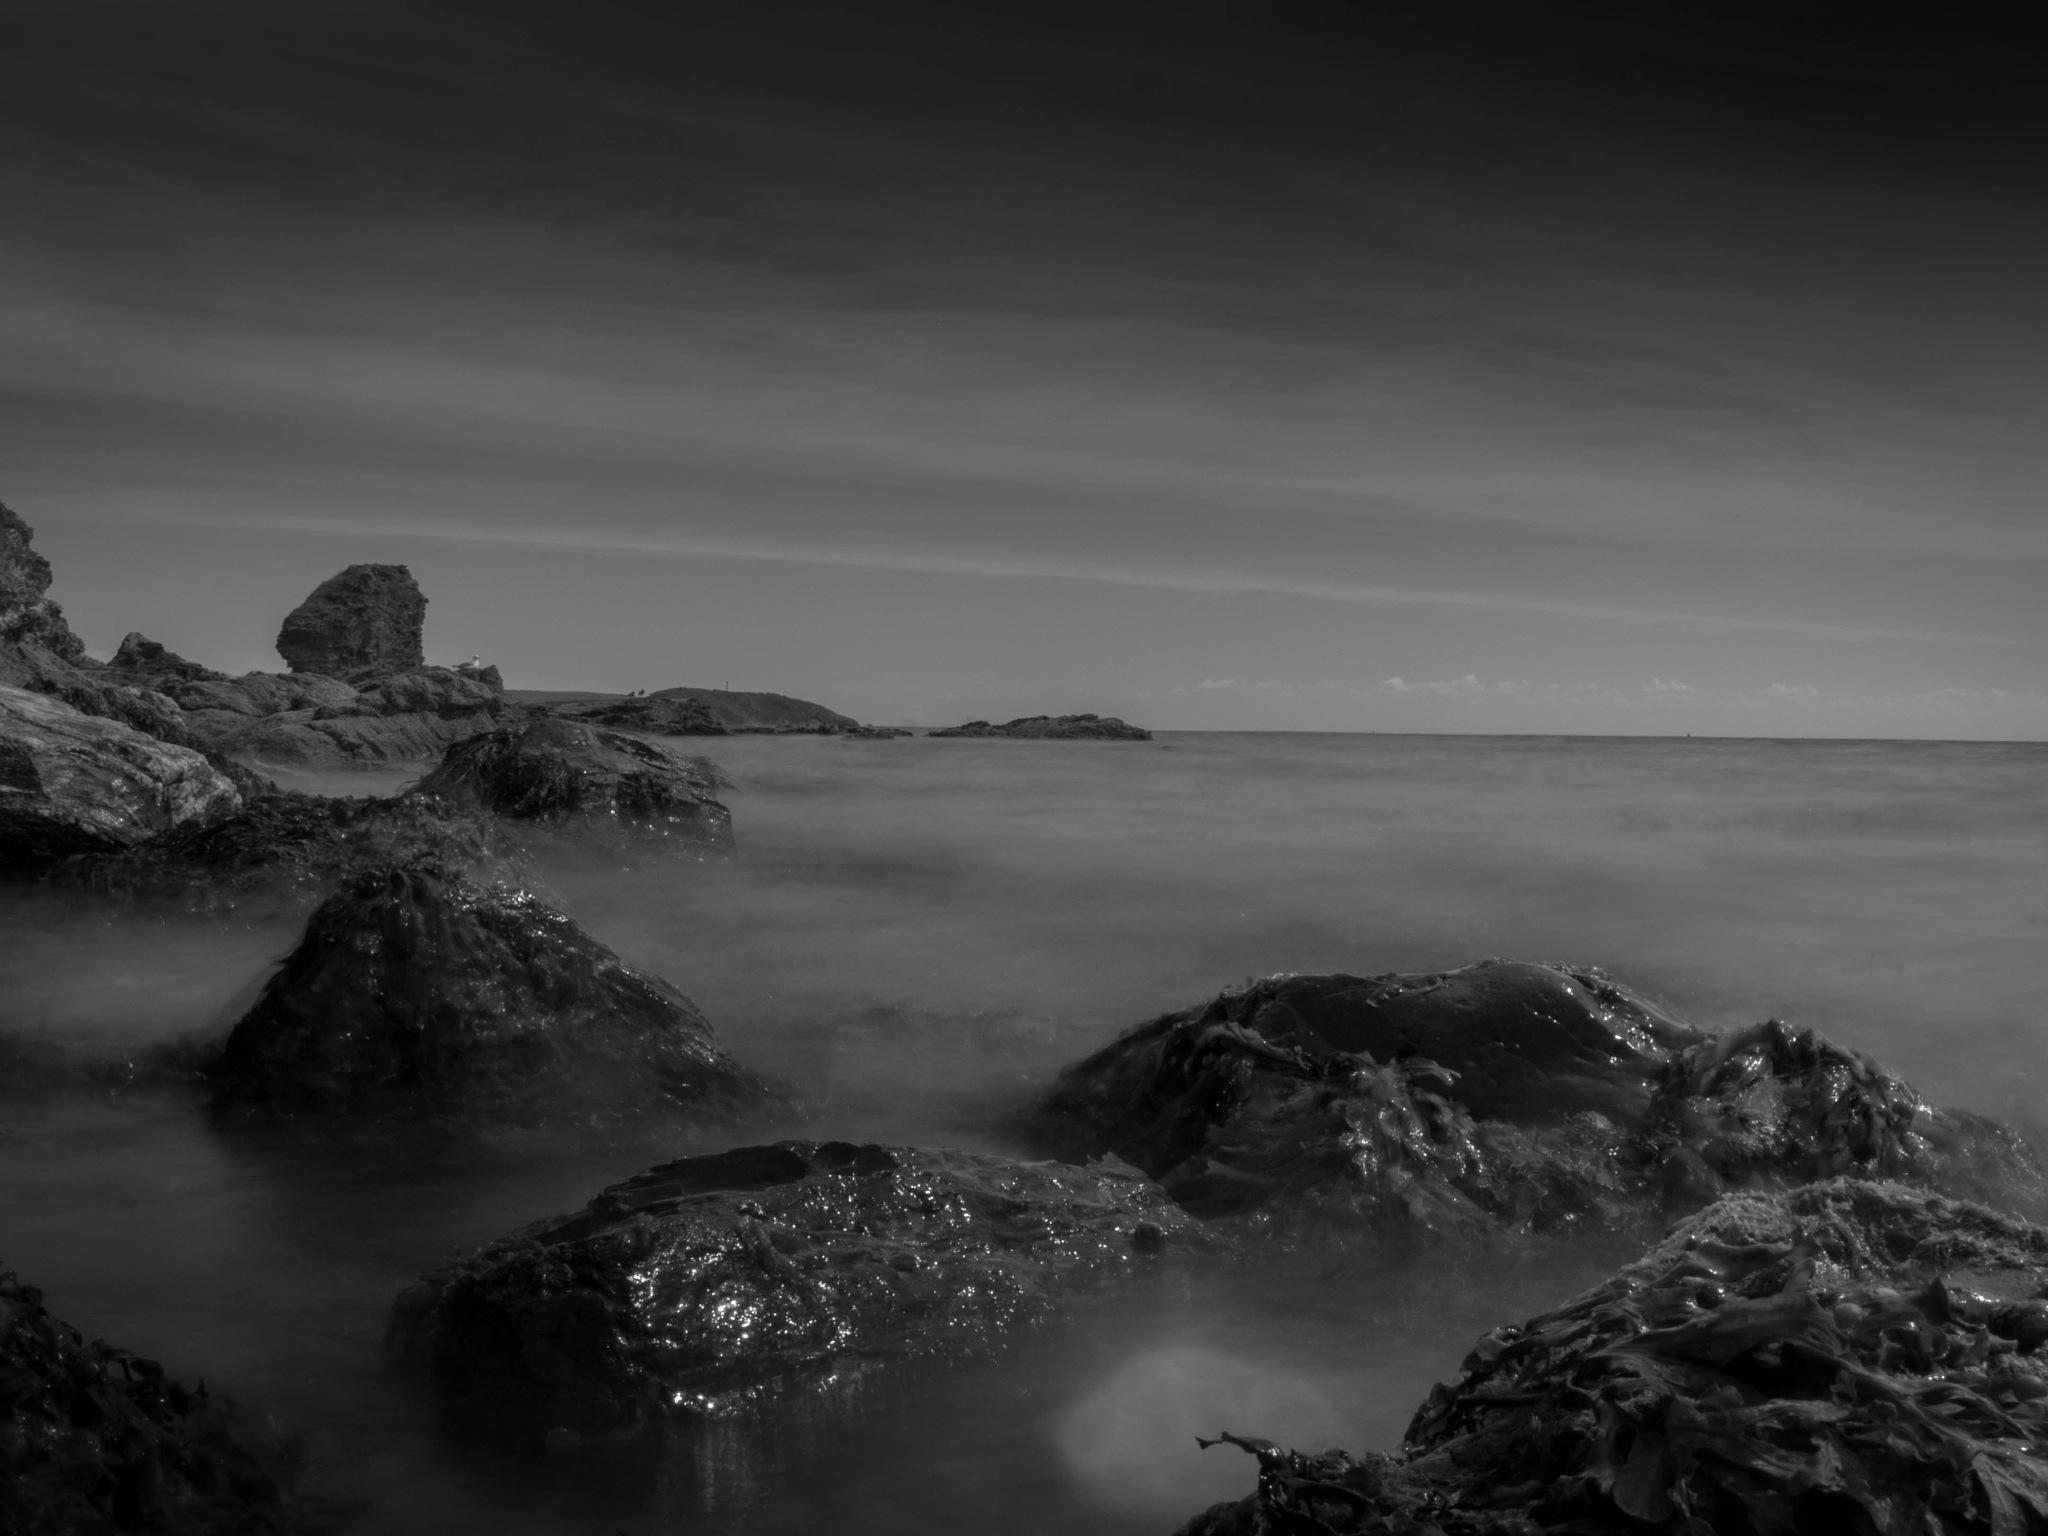 St Austell Cornwall by chris.bardsley.39